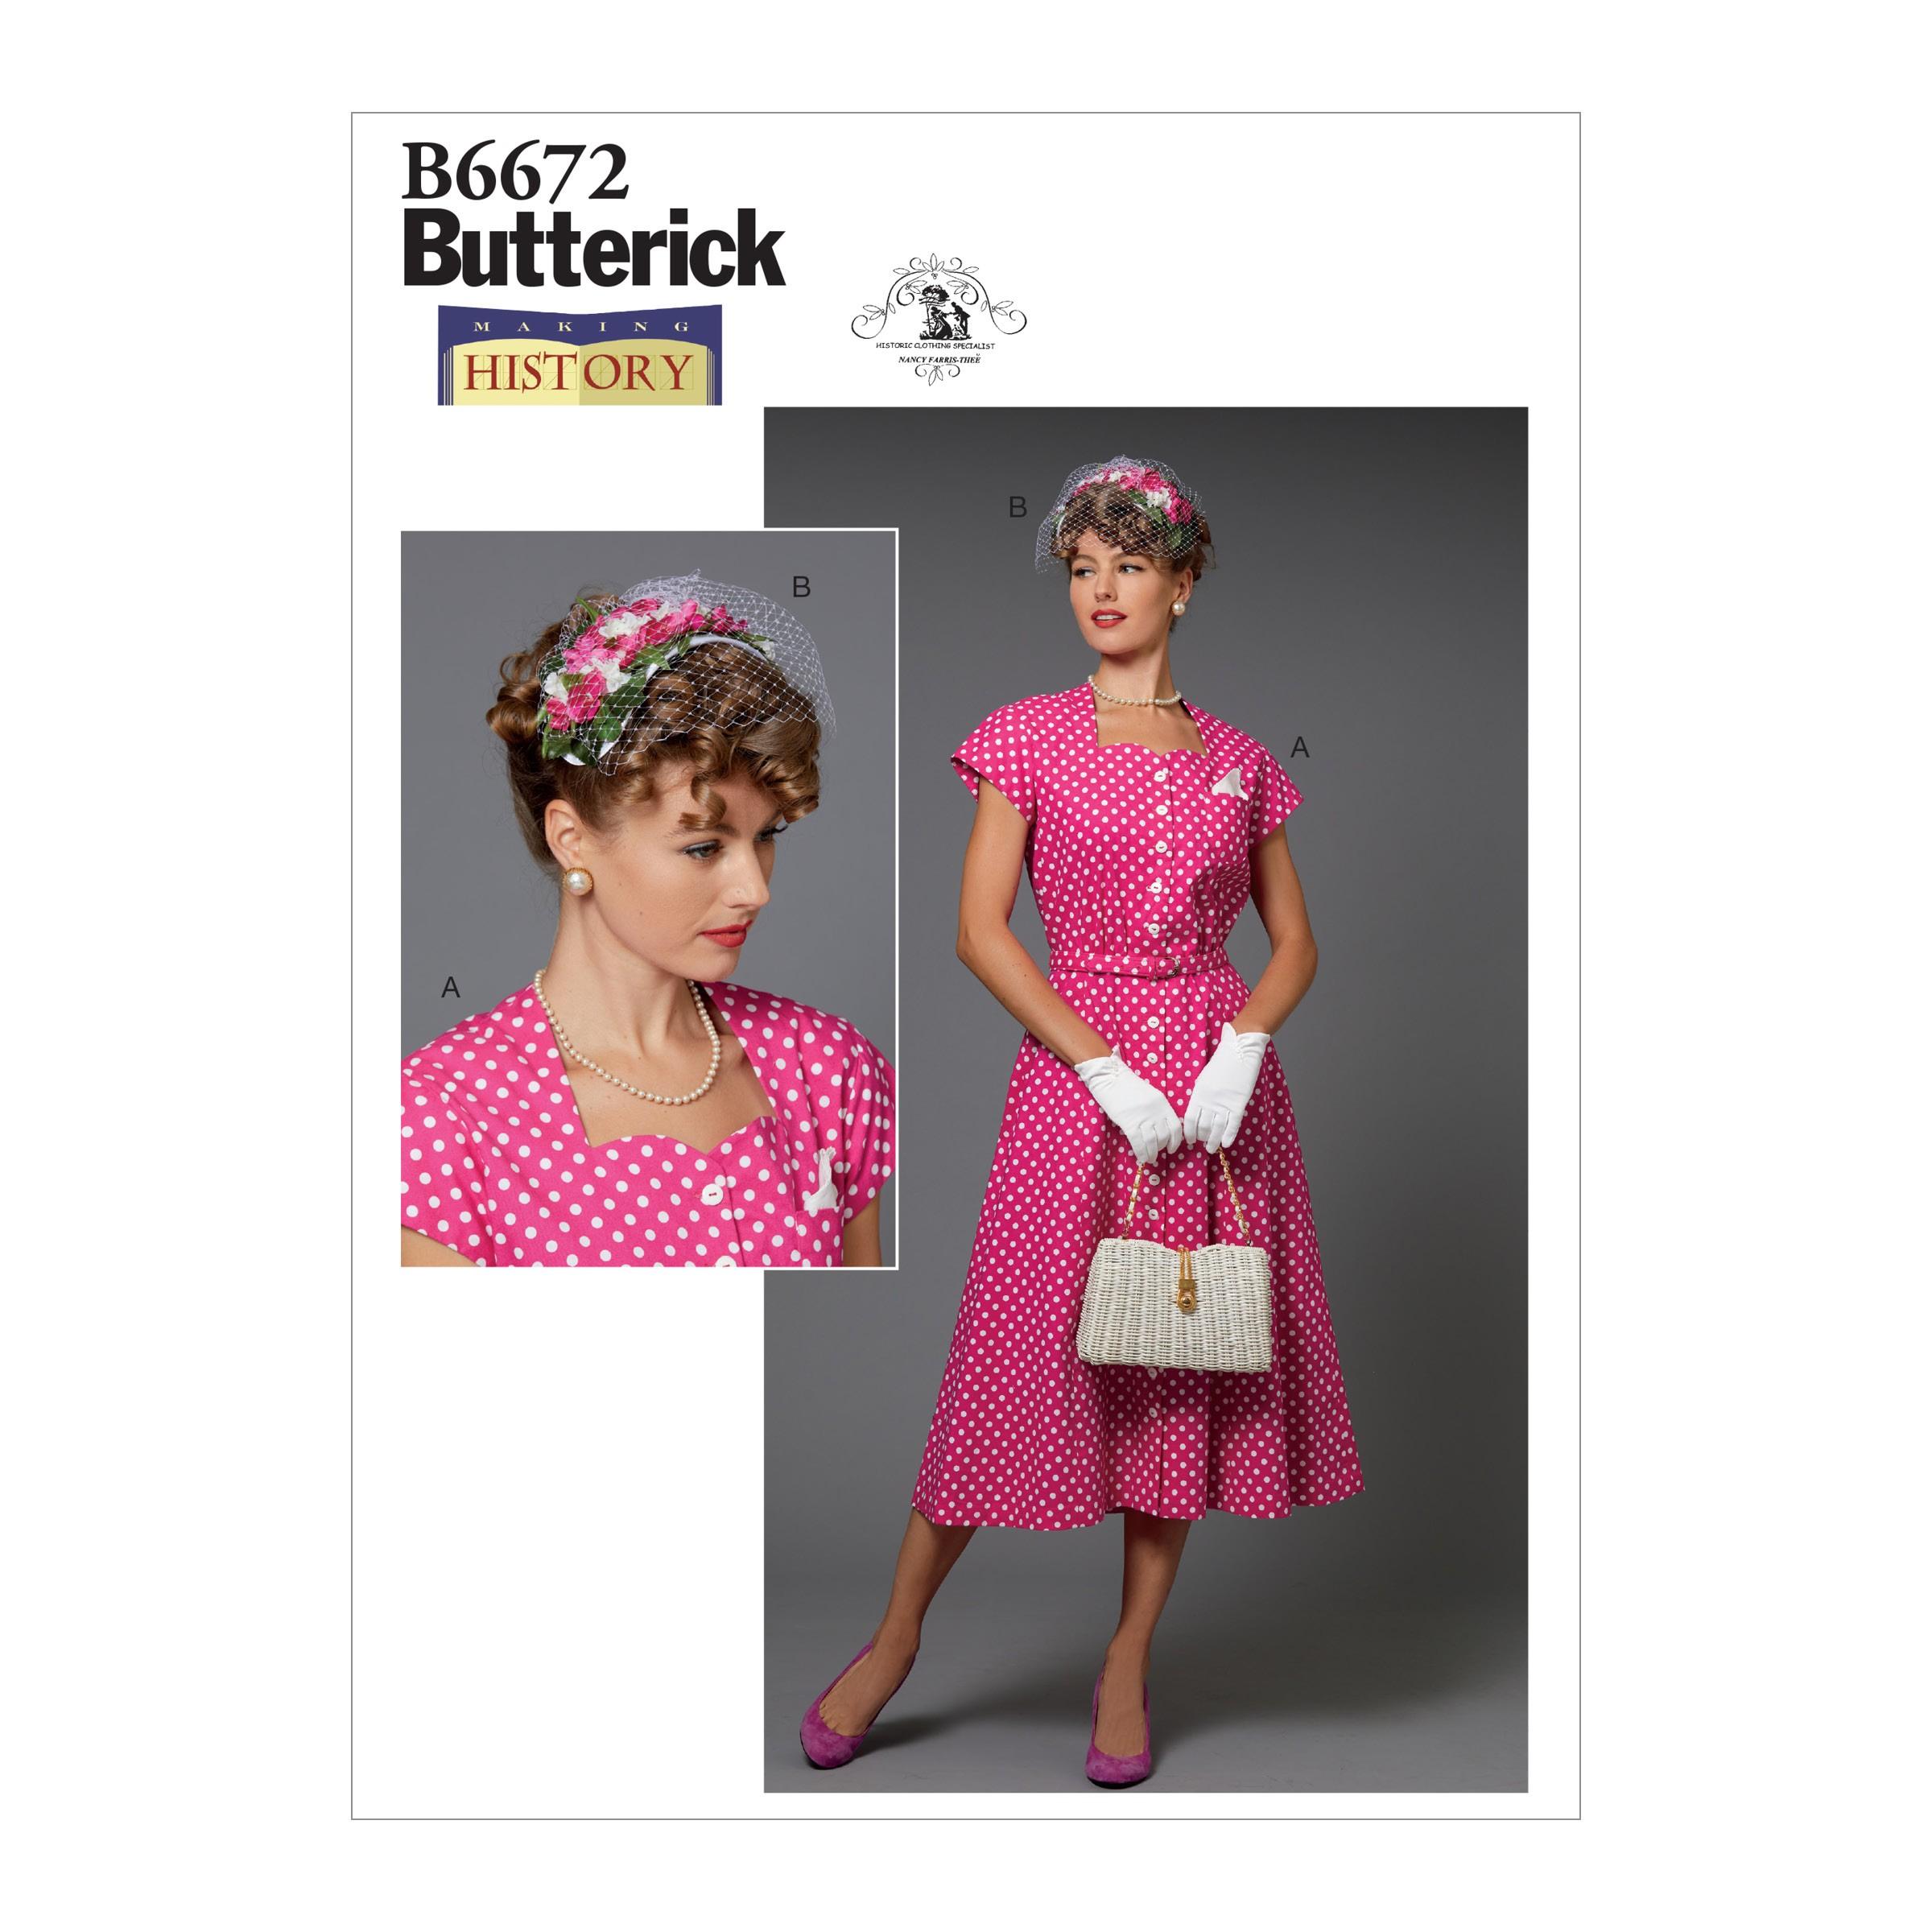 Butterick Sewing Pattern 6672 Misses' Vintage Inspired Audrey Hepburn Dress